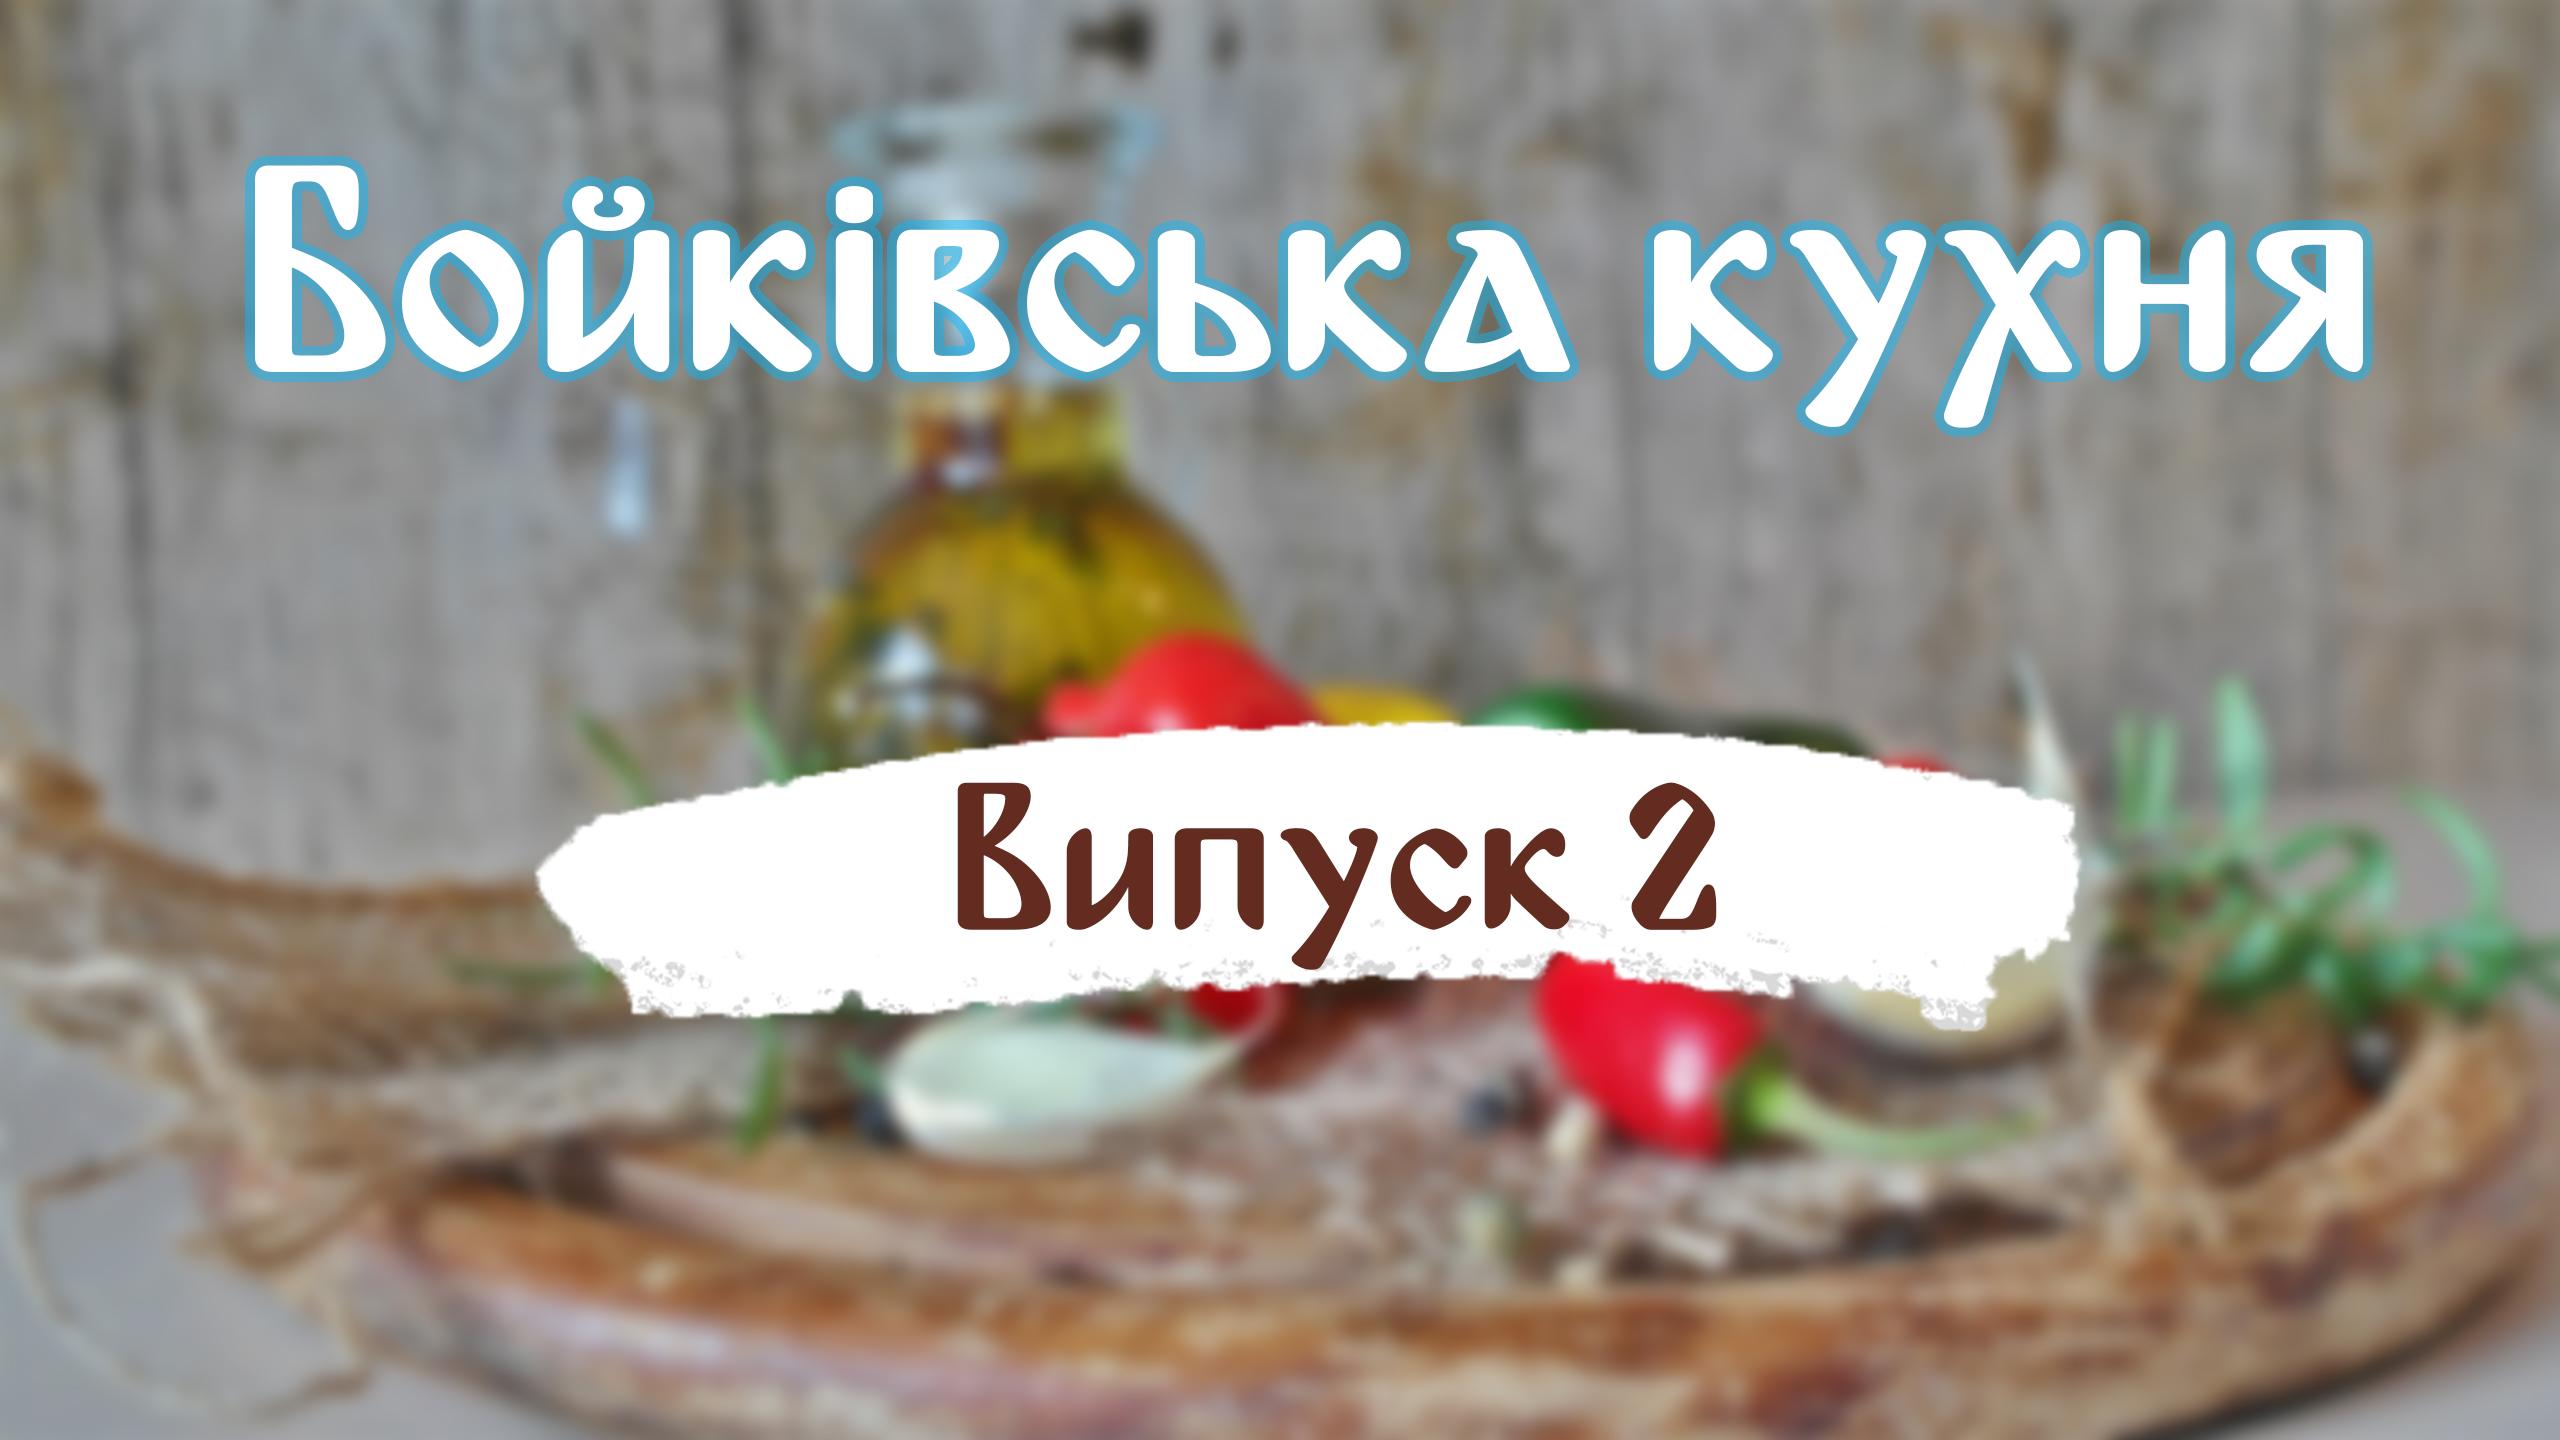 Бойківська кухня. Випуск 2. Лобода.